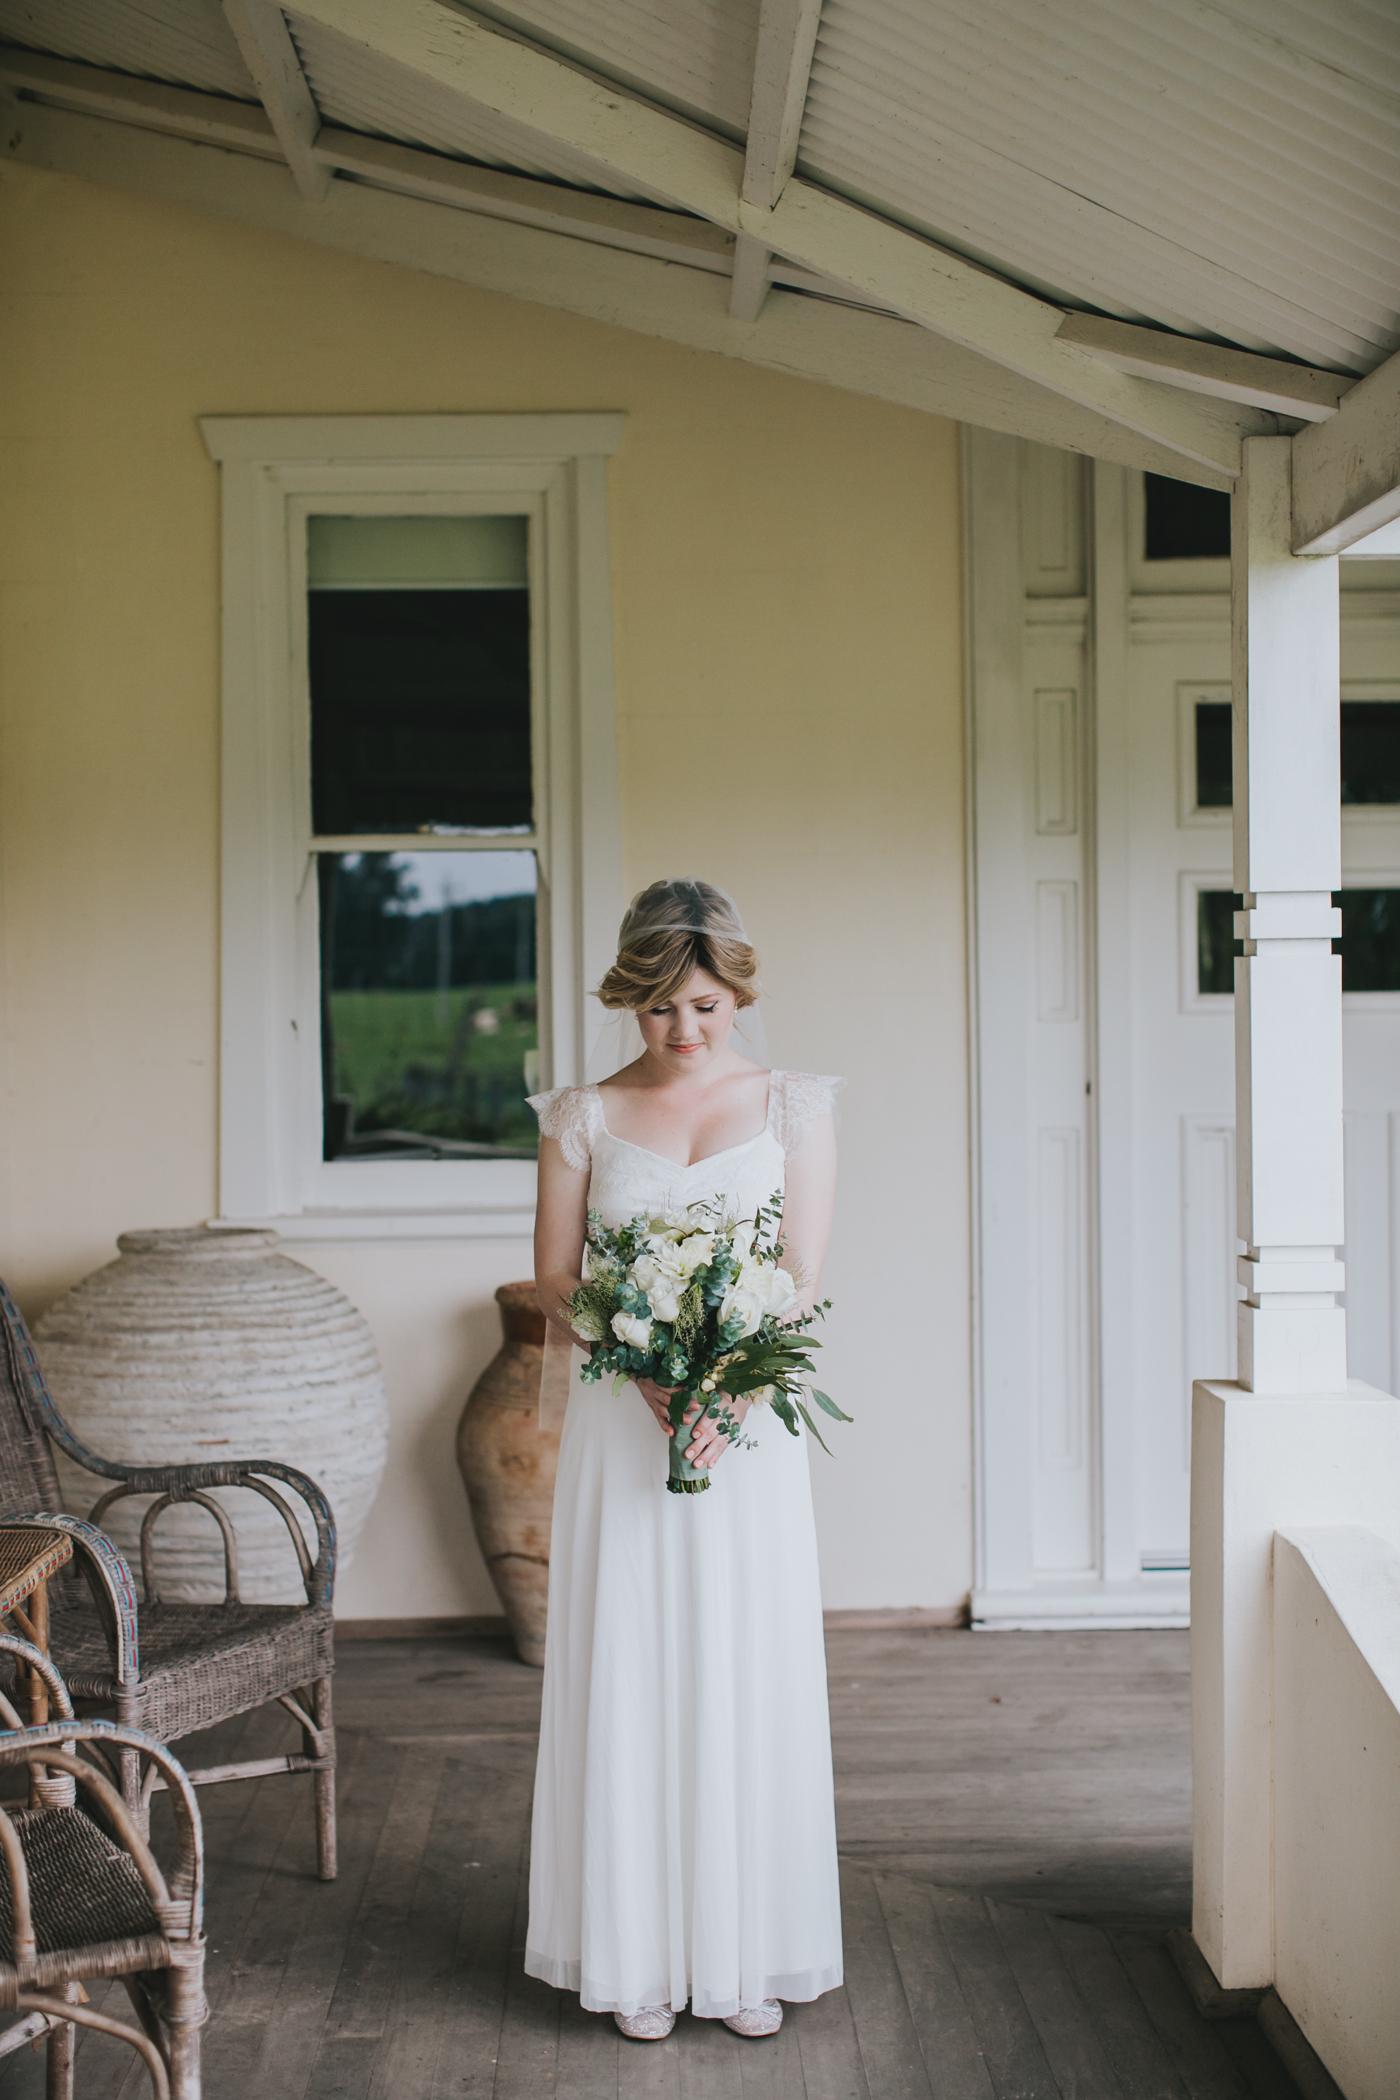 Rachel & Jacob - Willow Farm Berry - South Coast Wedding - Samantha Heather Photography-42.jpg